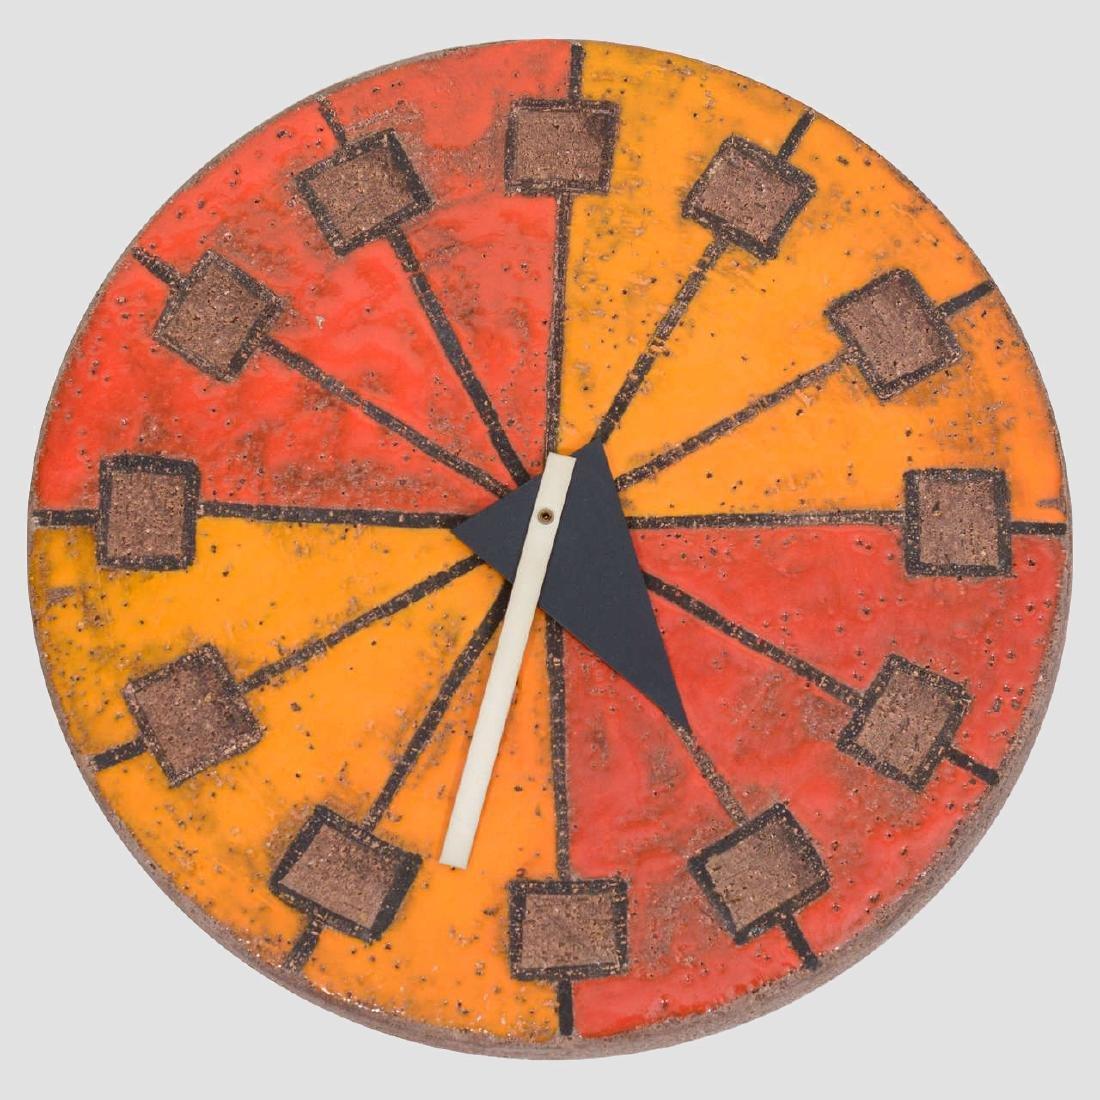 Howard Miller Italian Ceramic Clock